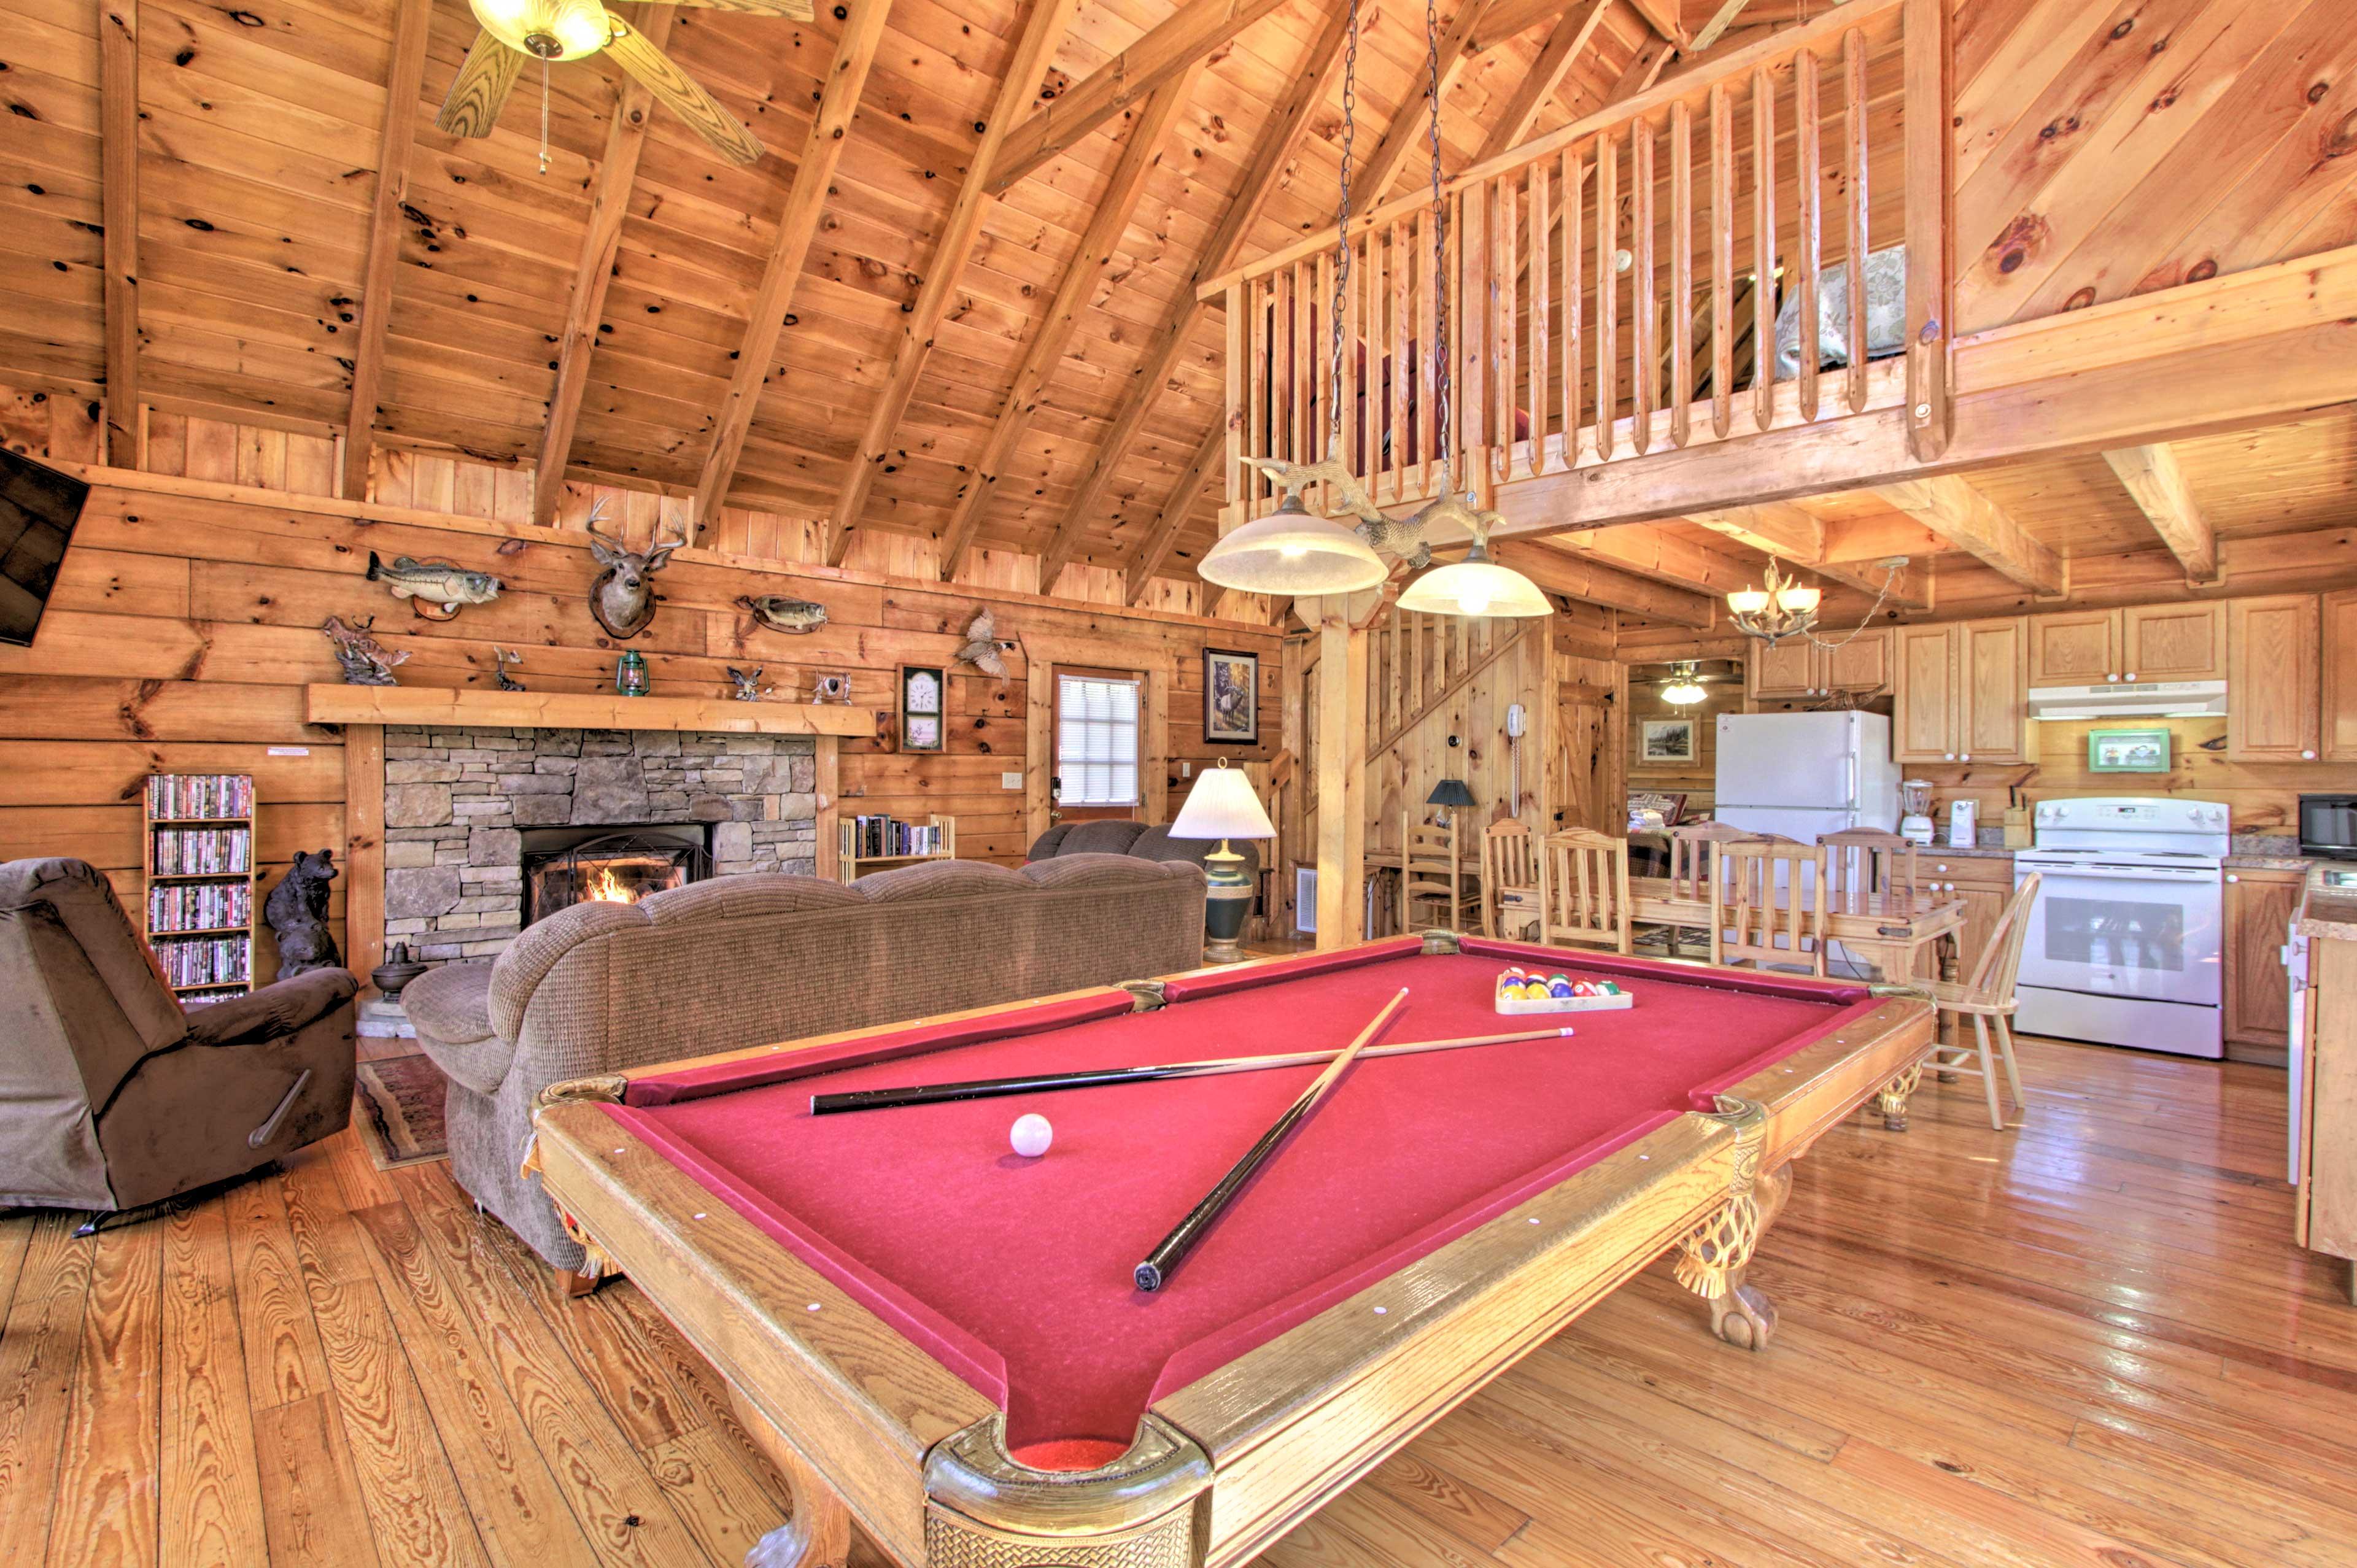 Sevierville Vacation Rental Cabin | 2BR + Loft | 2BA | 2,016 Sq Ft | 2 Stories